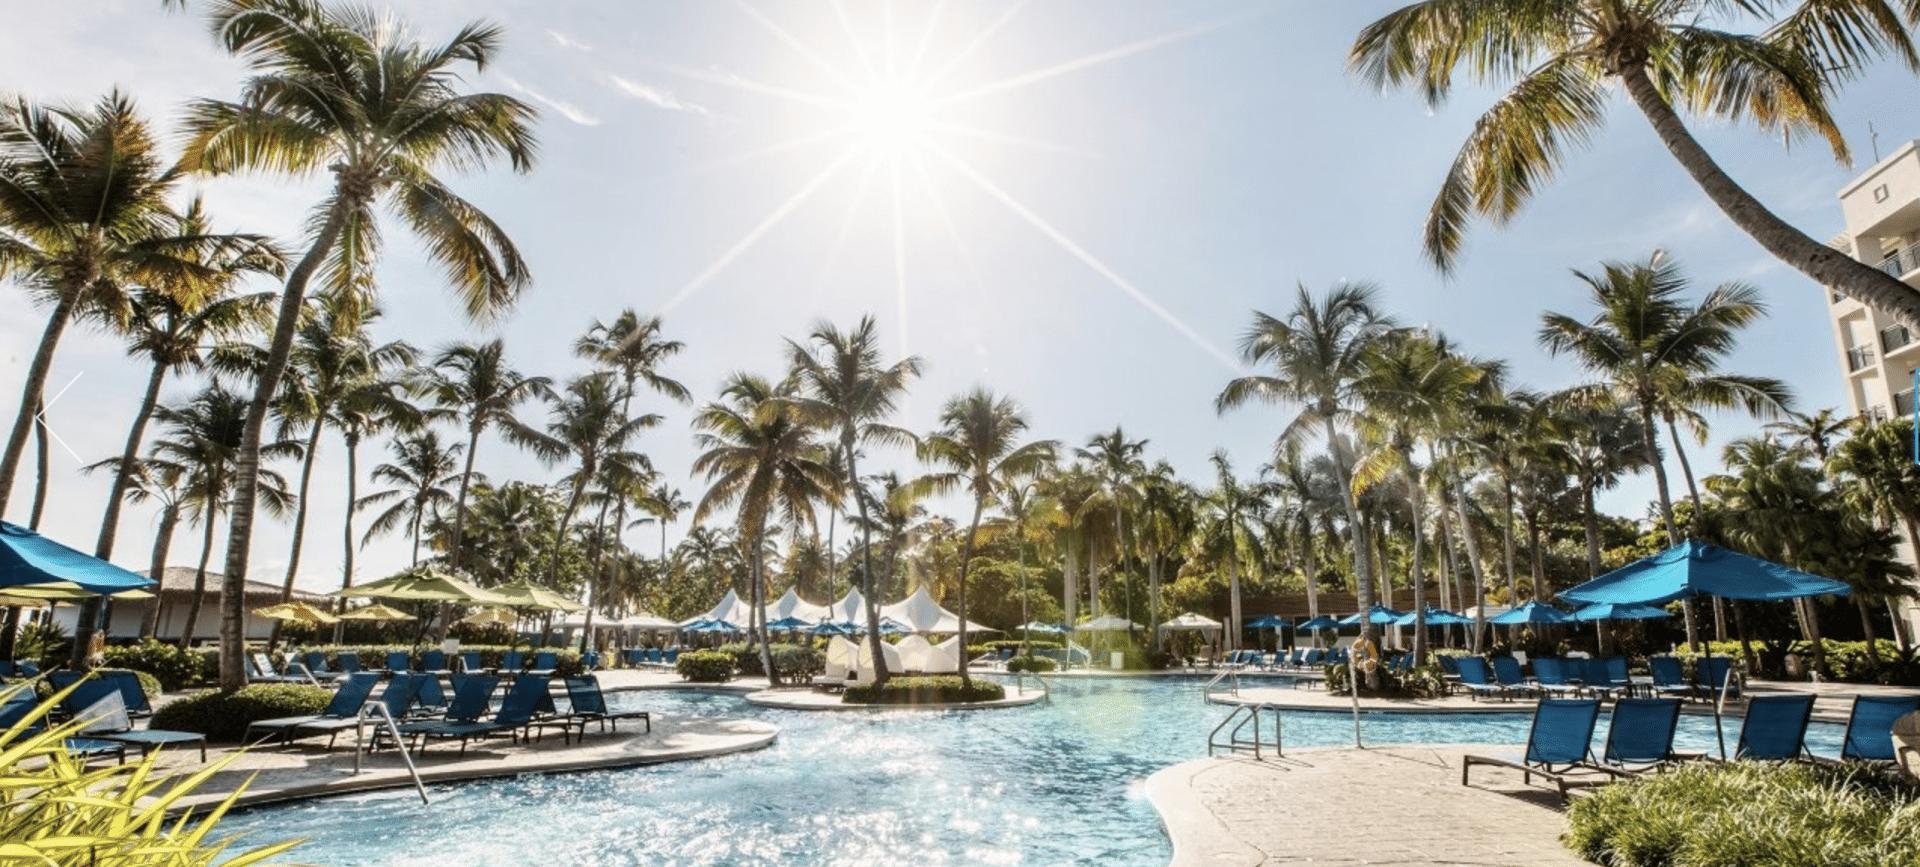 Wyndham Rewards Resorts.jpg